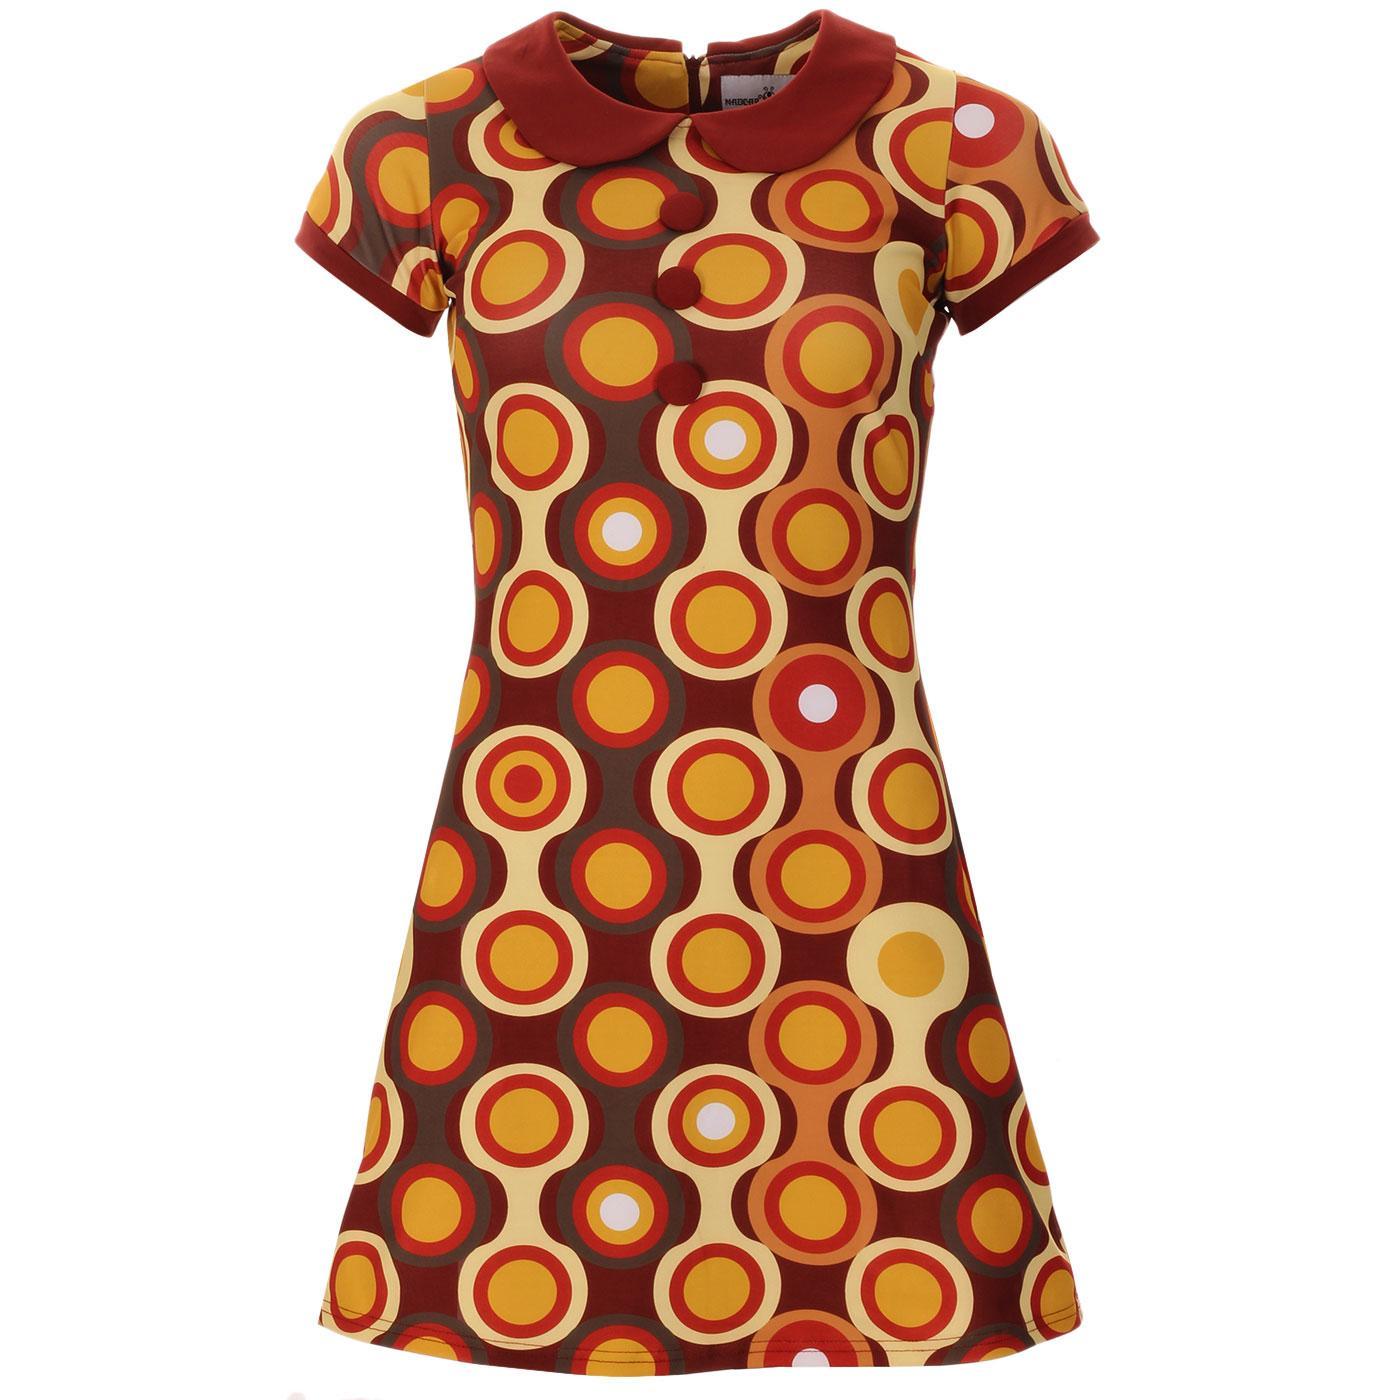 Madcap England Dollierocker Psych-Out! Circles 60s Mod Peter Pan Collar Dress in Brown/Mustard